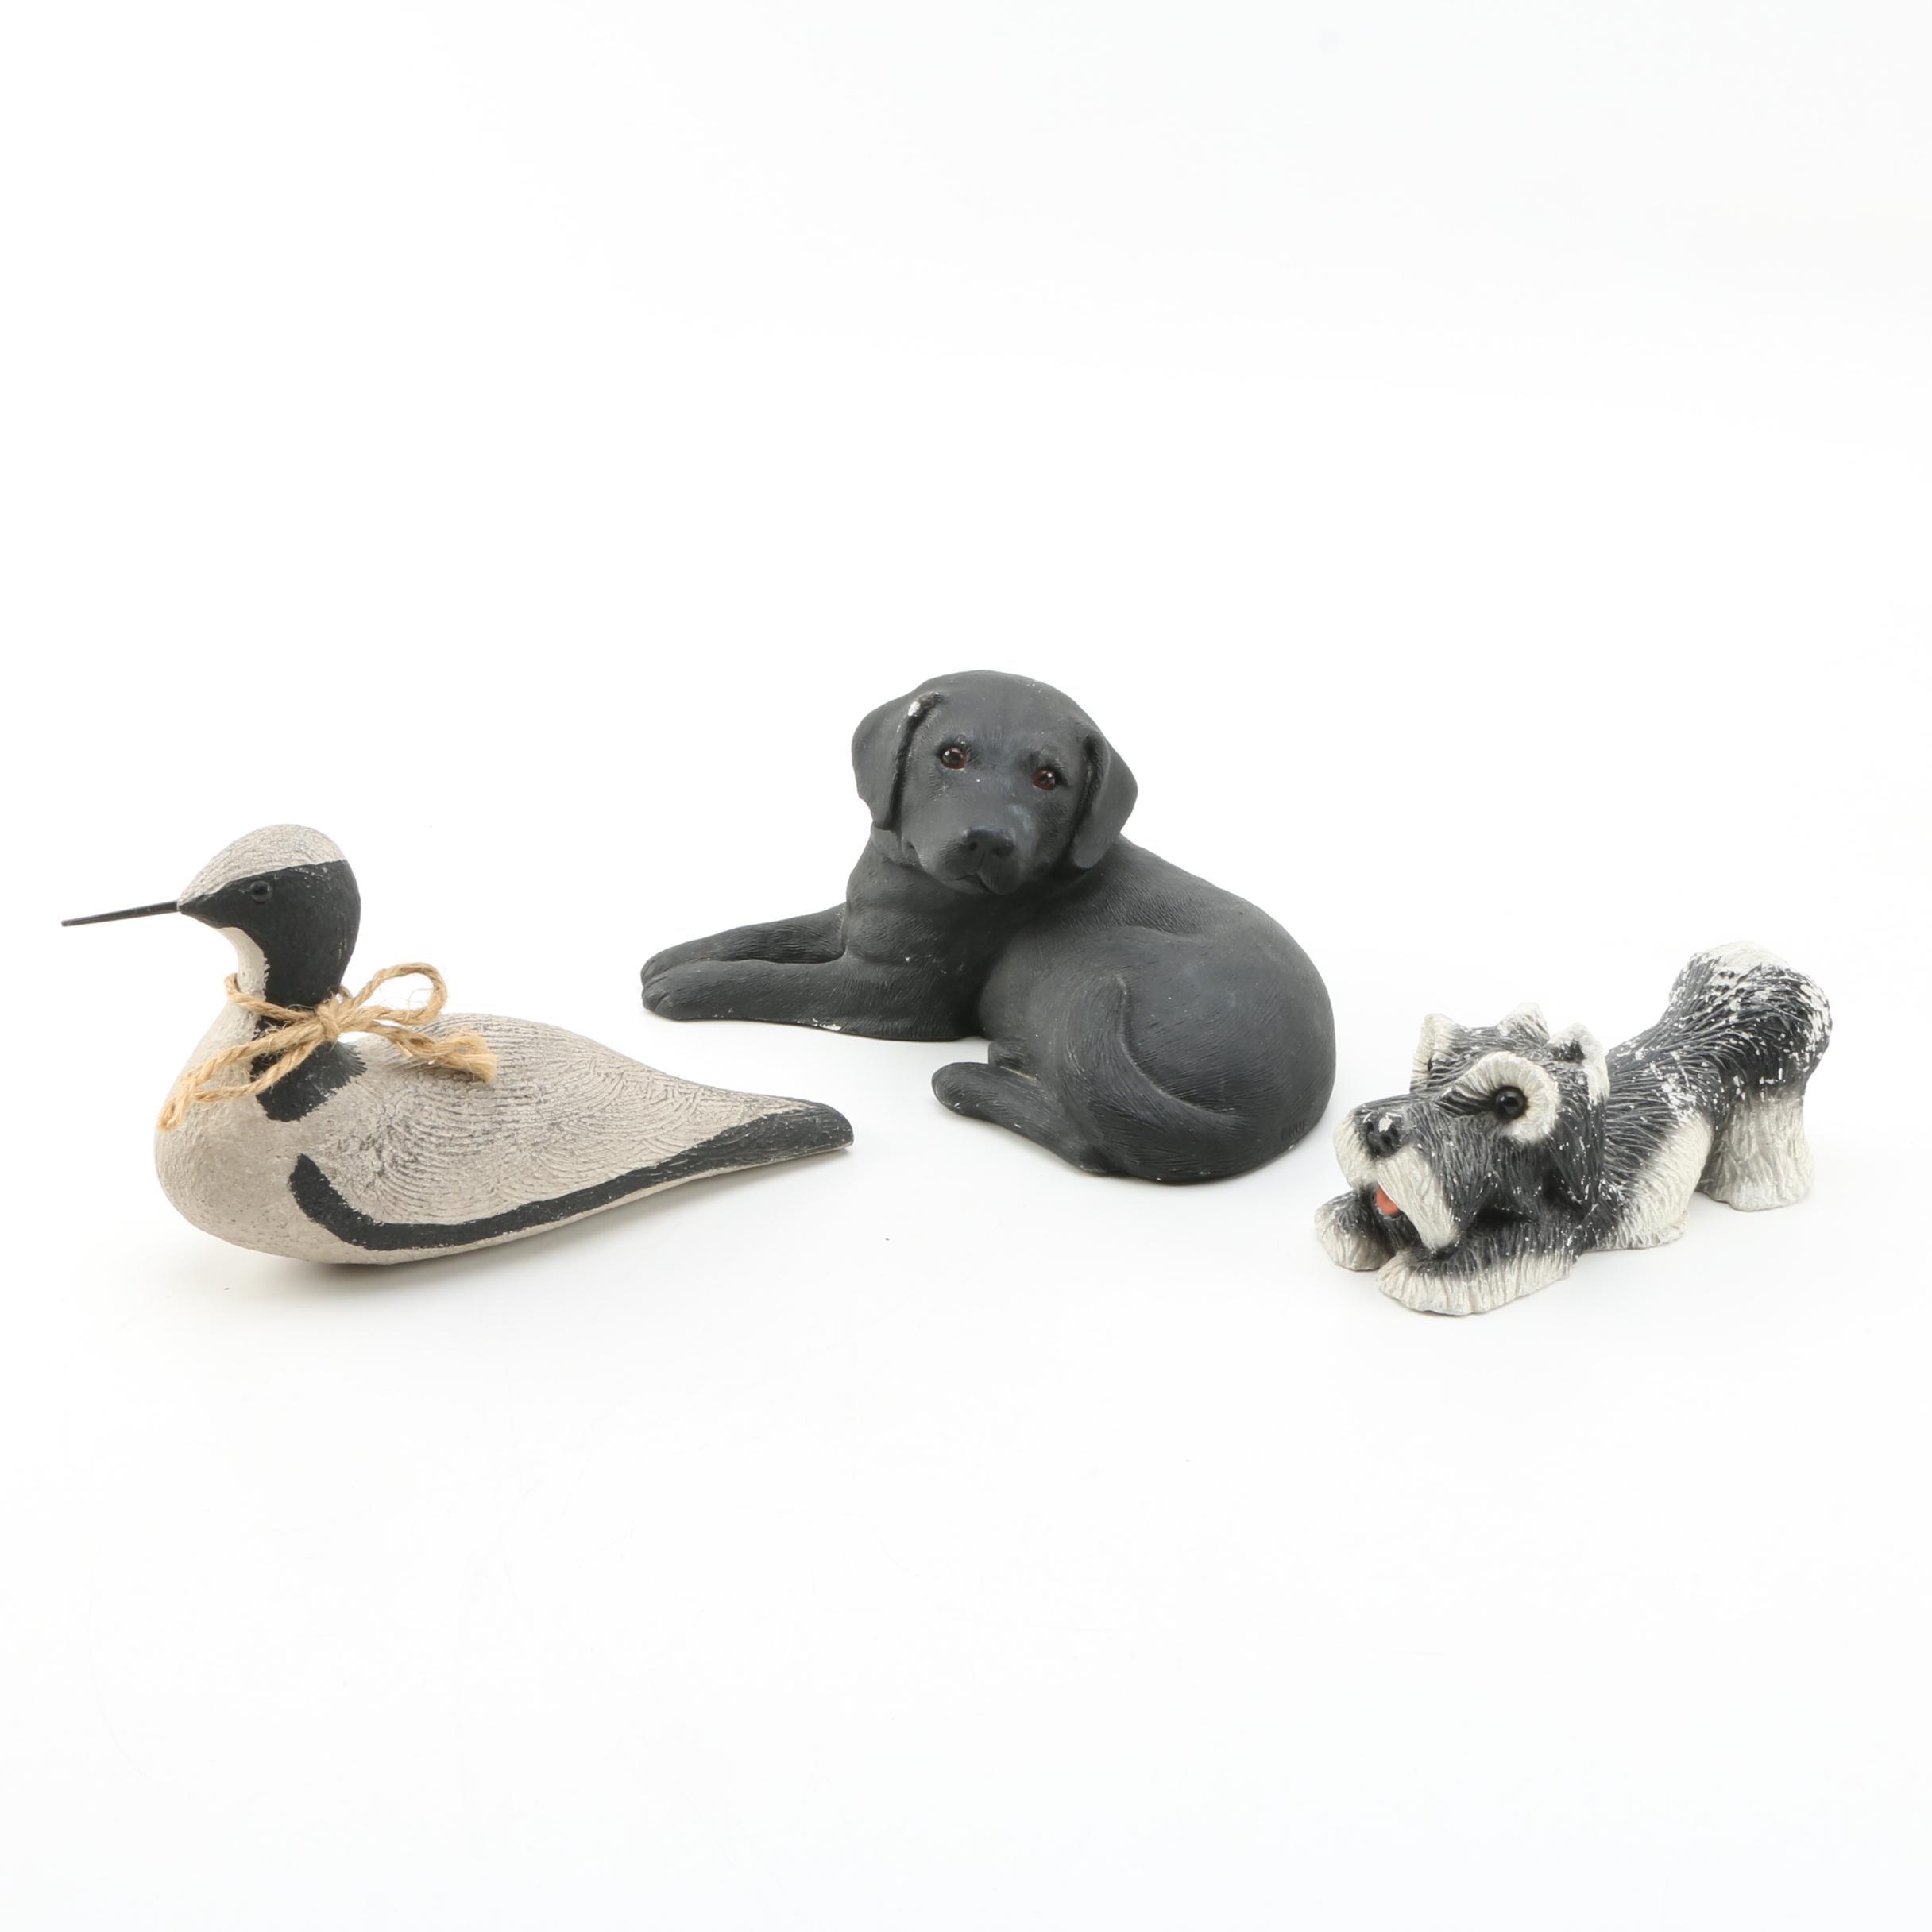 Three Ceramic Animal Themed Figurines